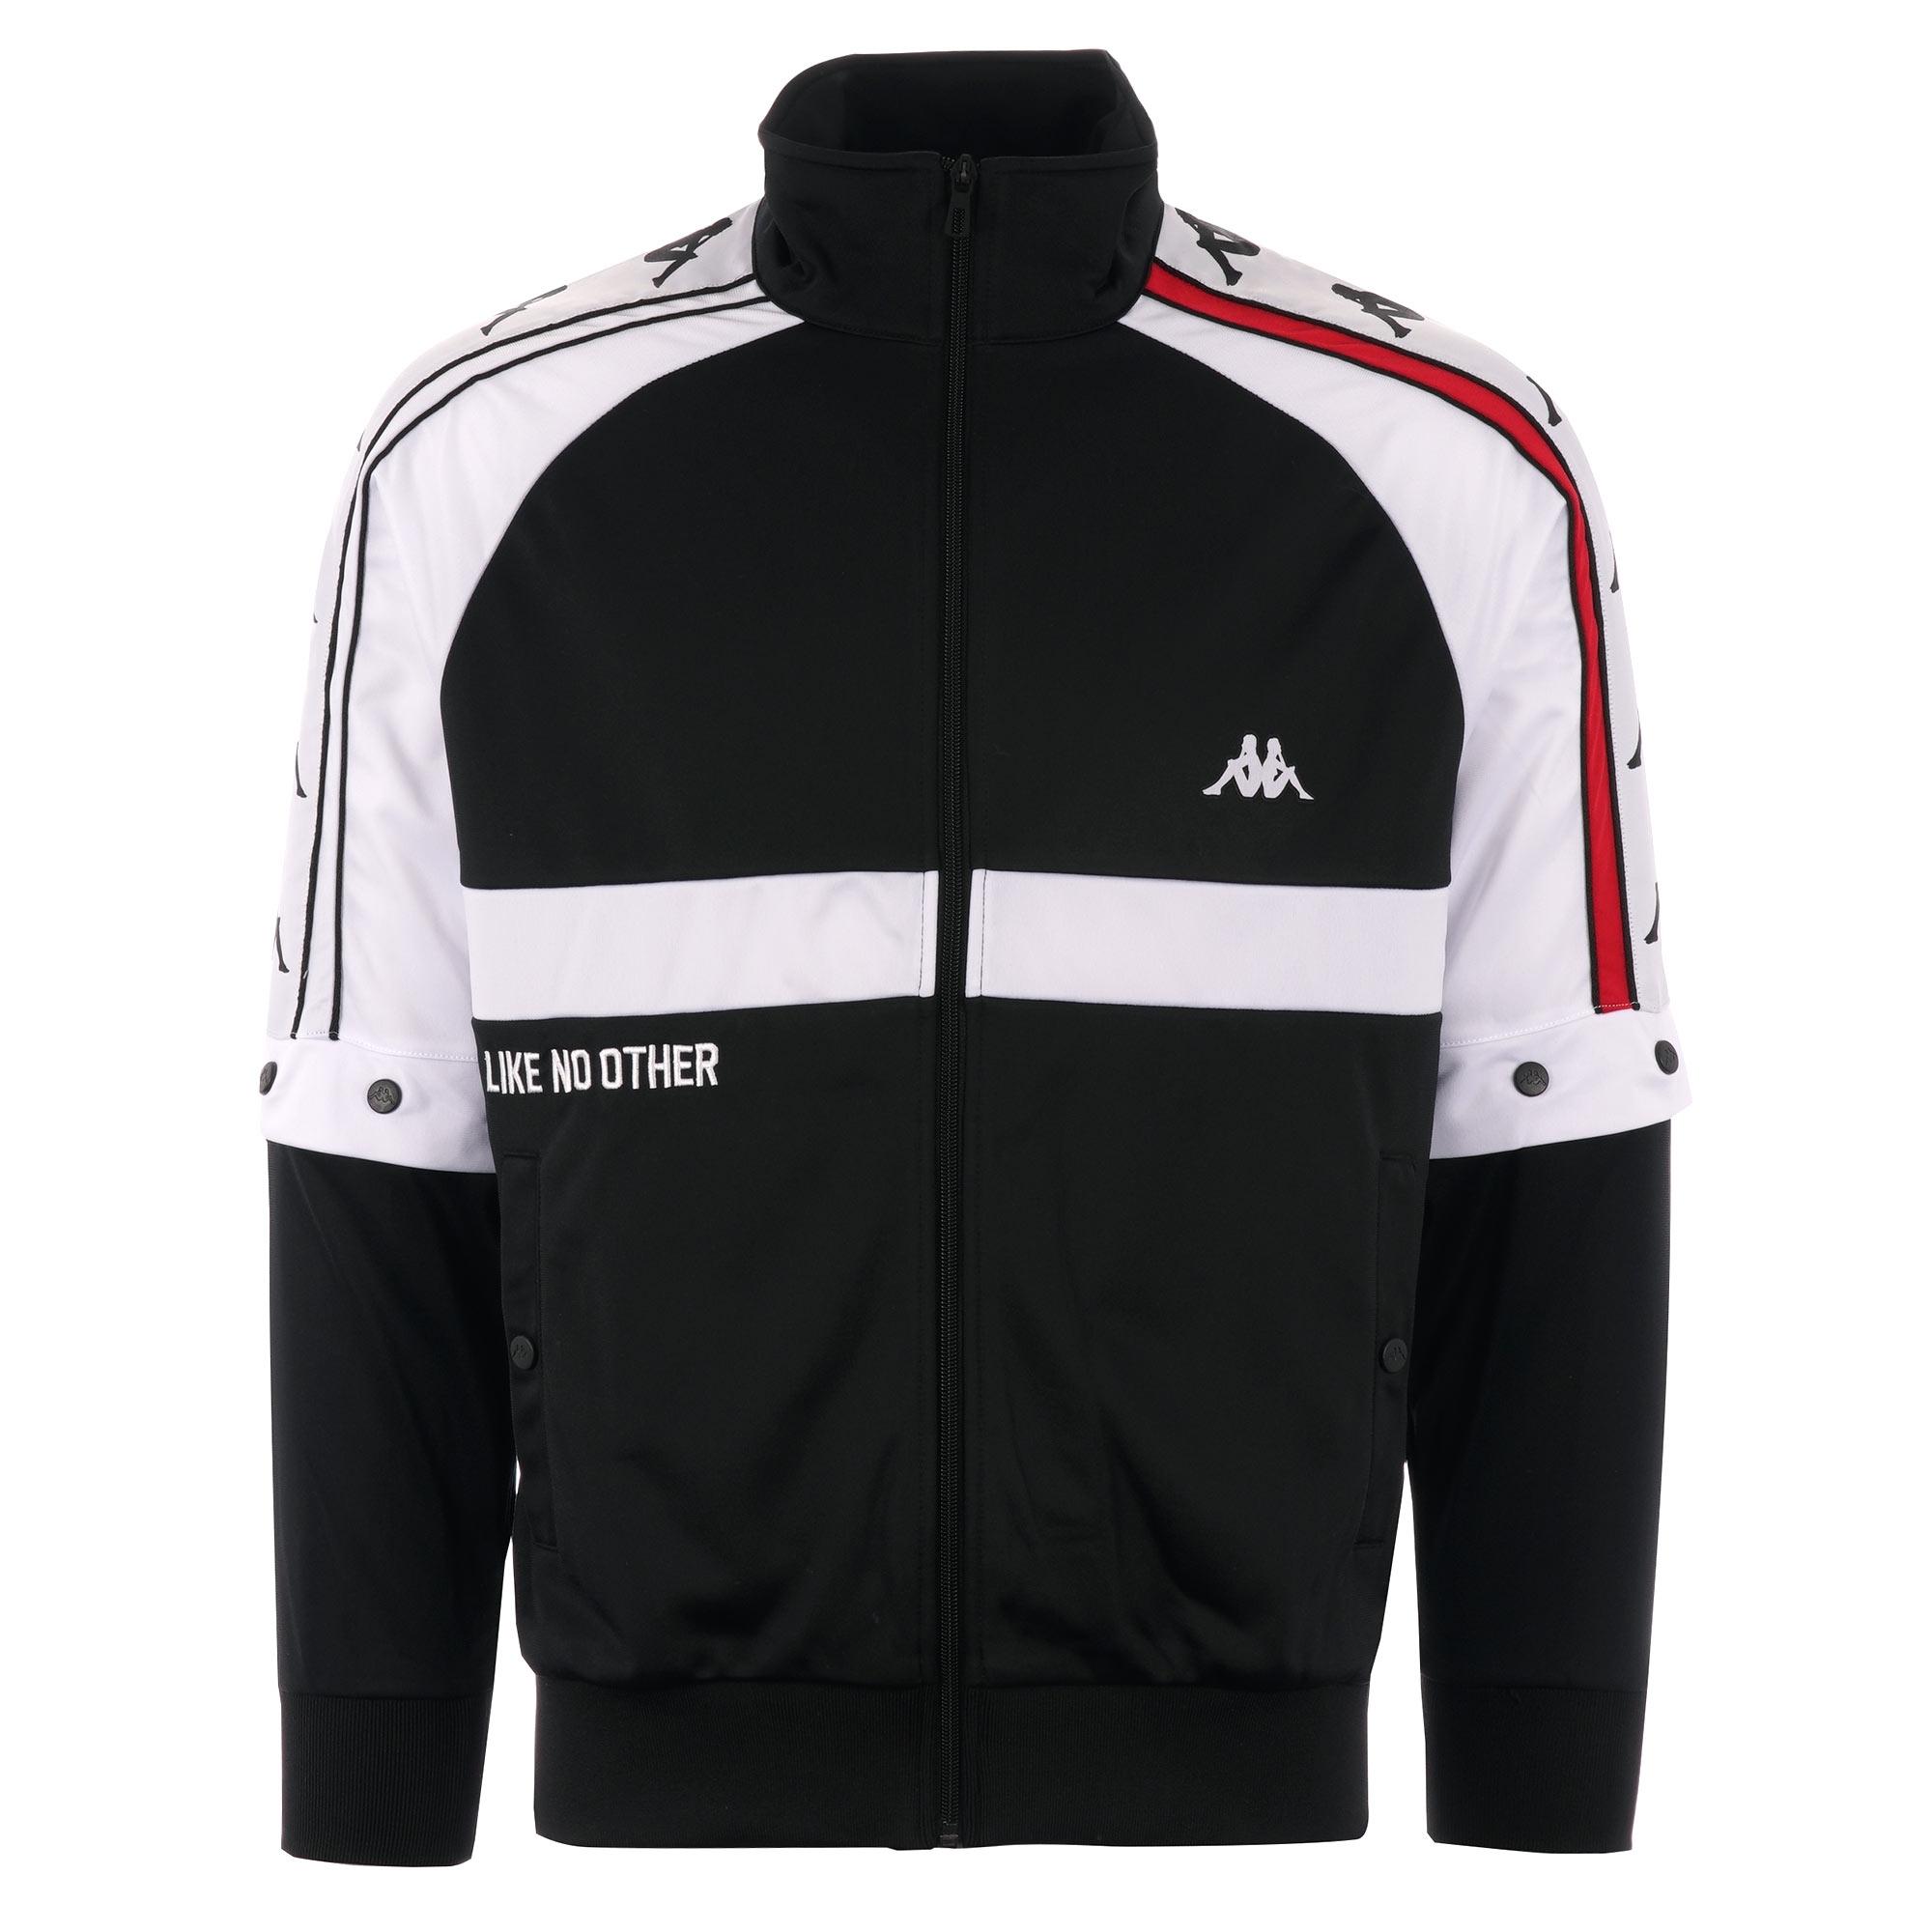 01259762e8 Kappa Bafer Authentic Jacket | Black, Red & White | 304IDF0